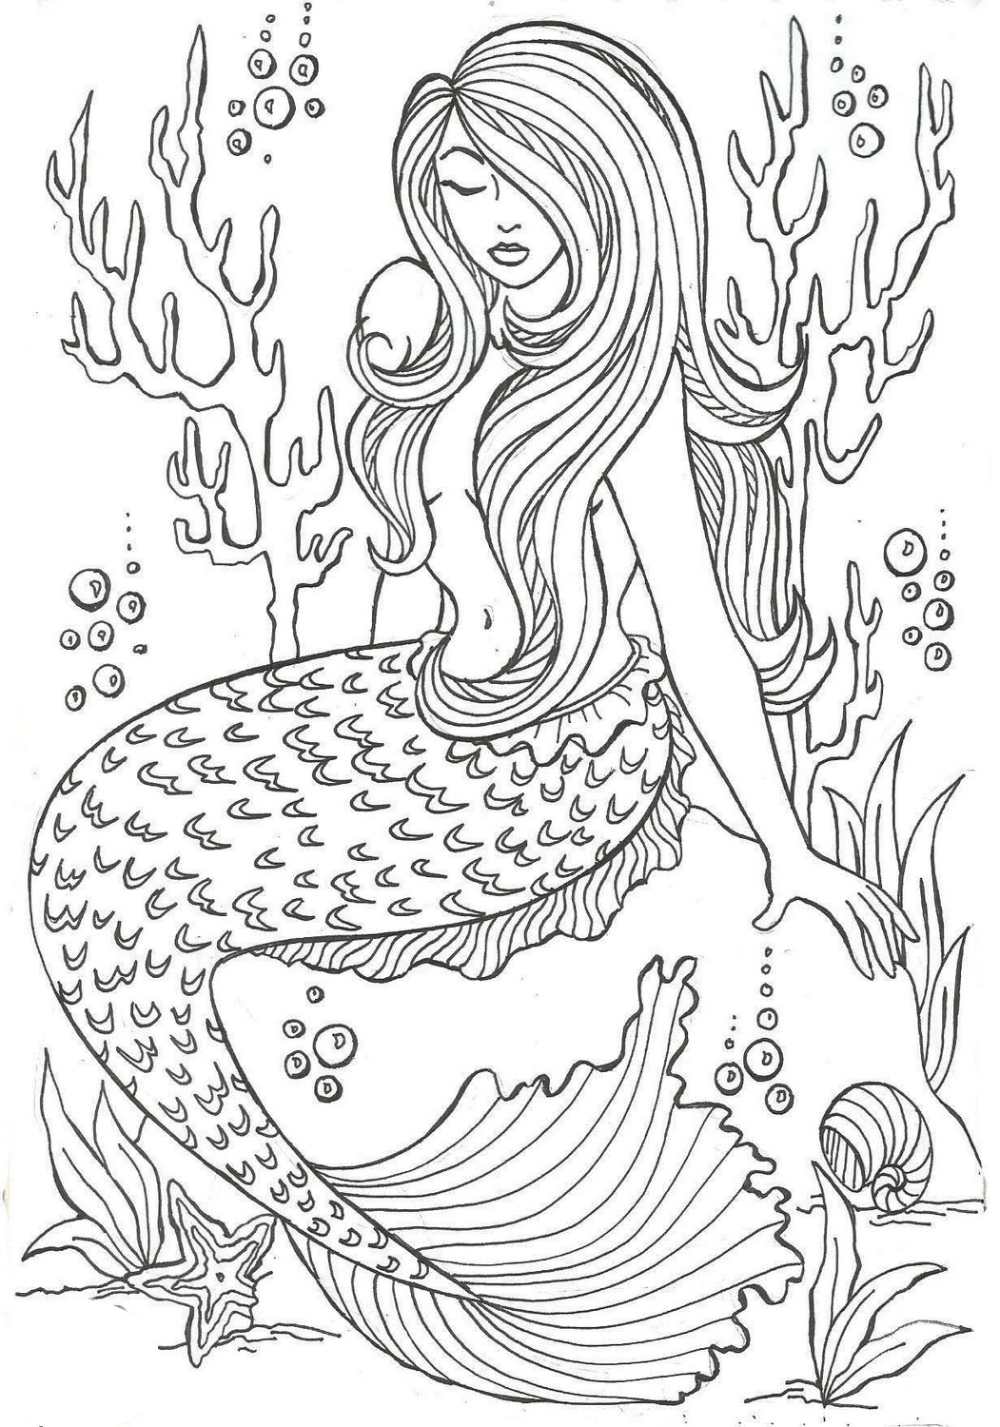 Realistic Mermaid Illustrations Undersea Coloring Sheets  Mermaid